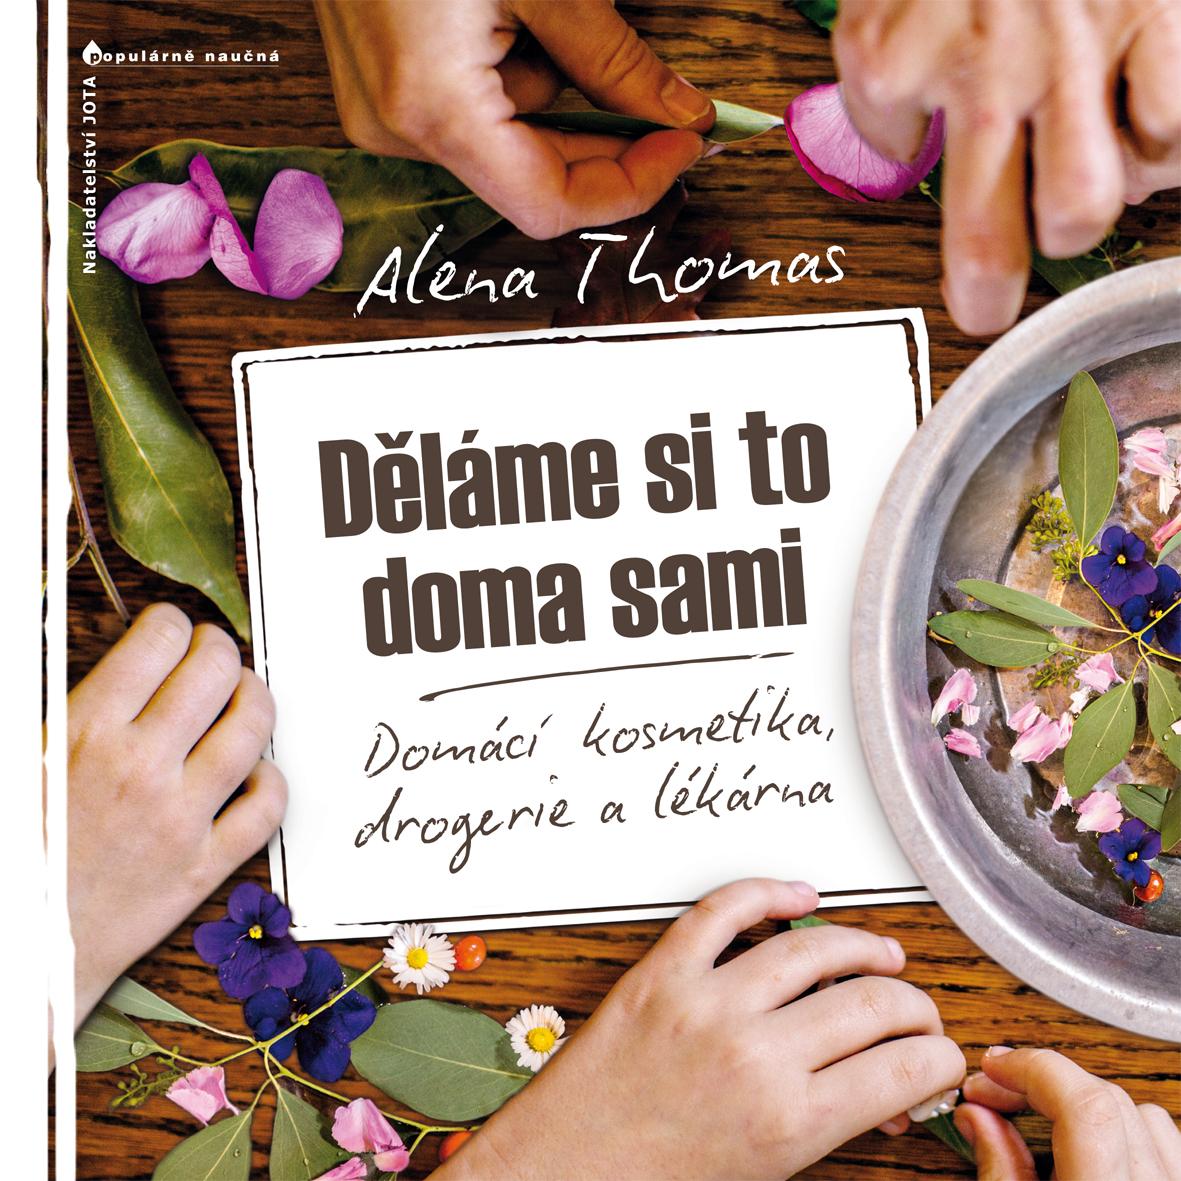 Jota Robíme si to doma sami - Alena Thomas